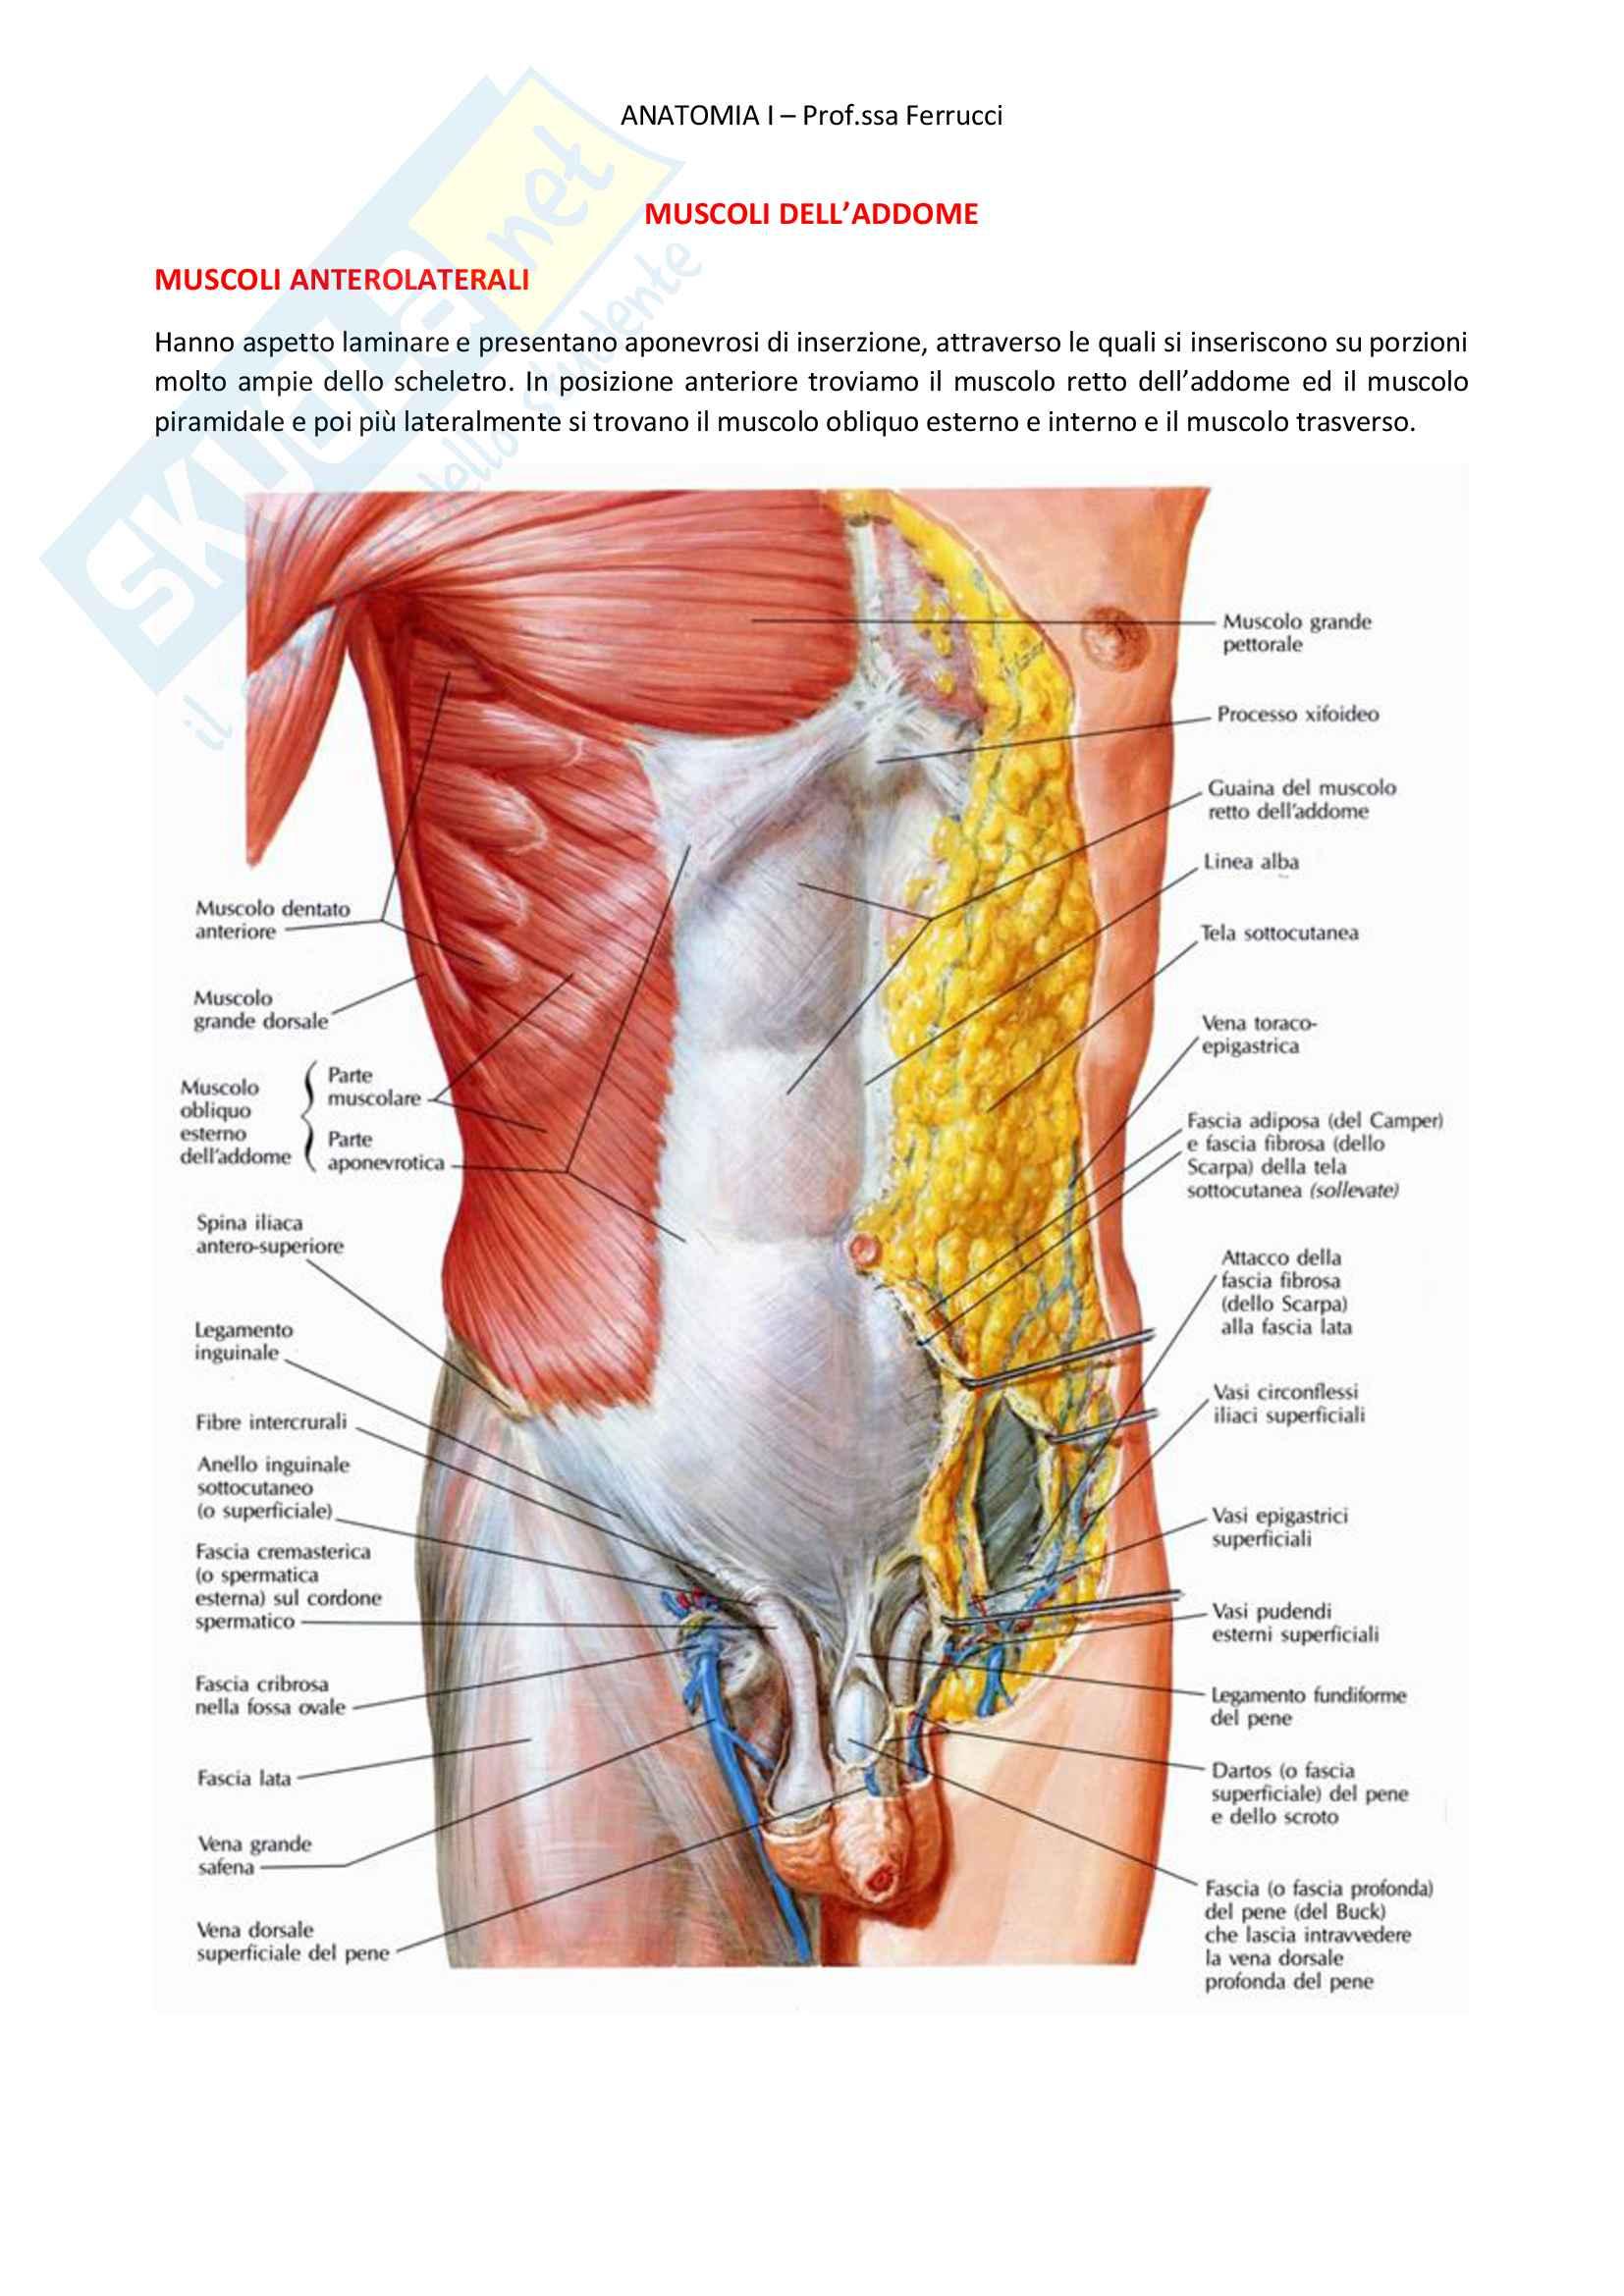 Lujoso Anatomía De La Fascia Viñeta - Imágenes de Anatomía Humana ...